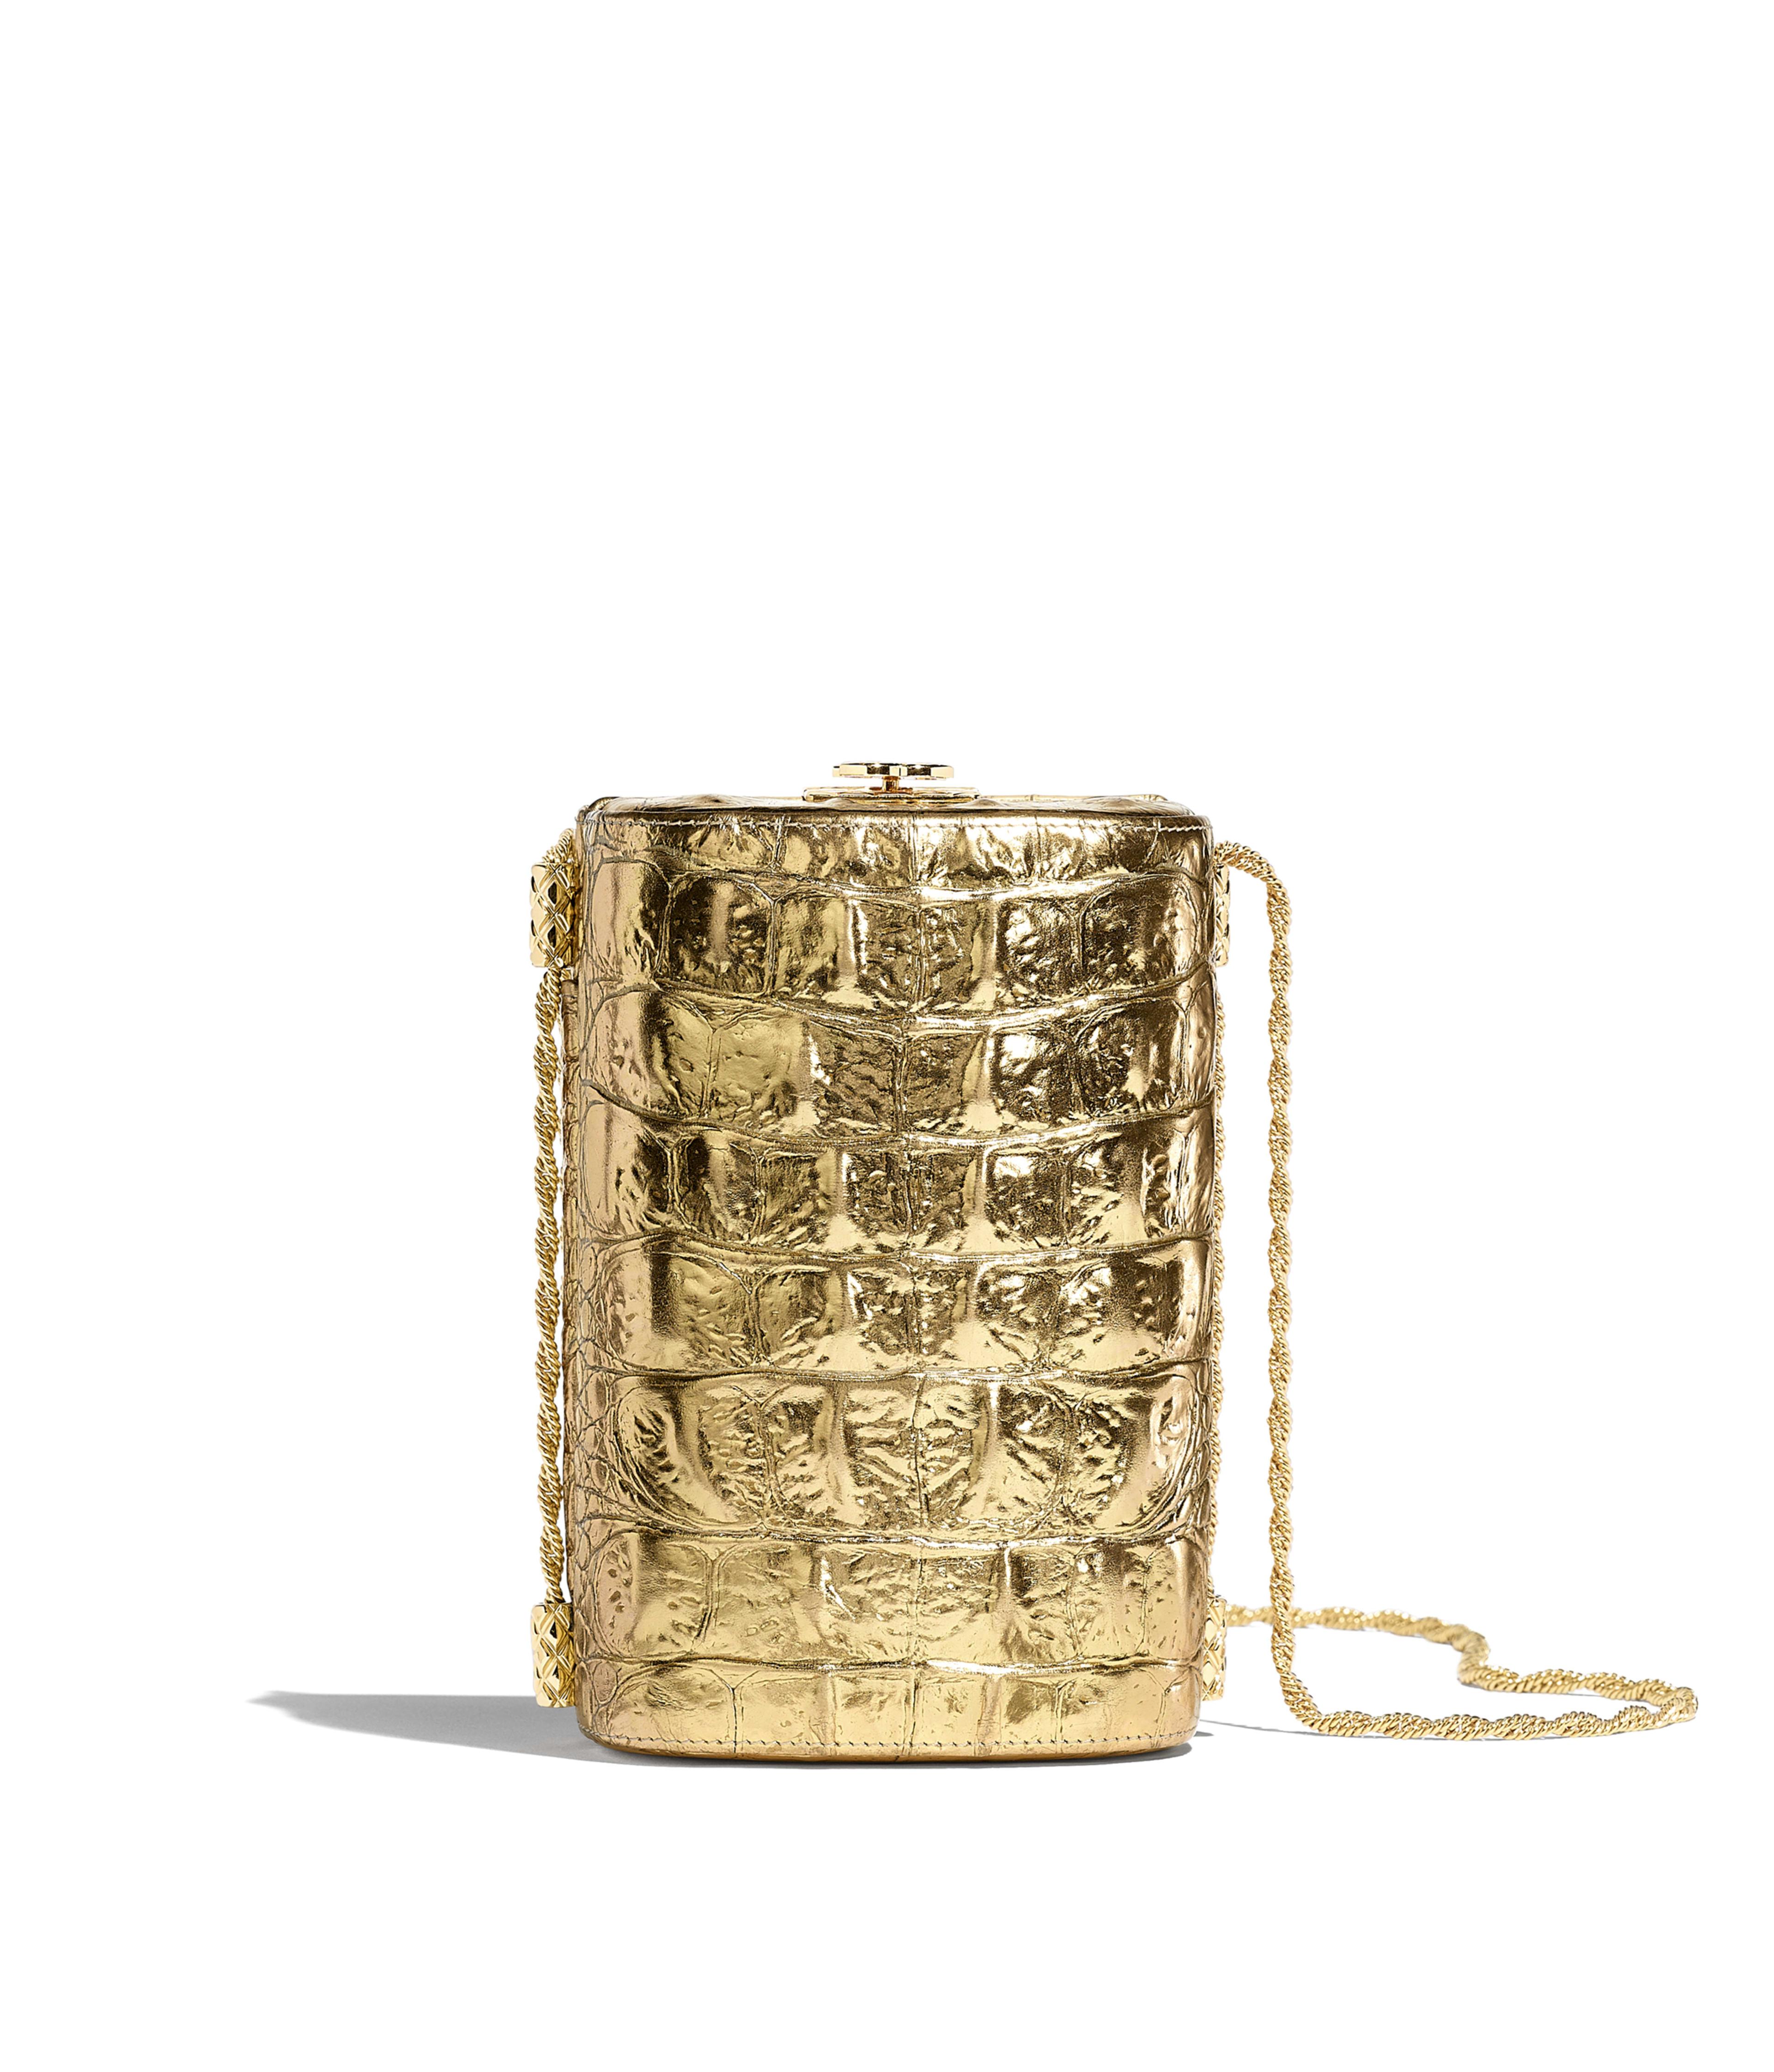 cf8399c59e Evening Bag Metallic Crocodile Embossed Calfskin & Gold Metal, Gold Ref.  AS0843B00902N4752